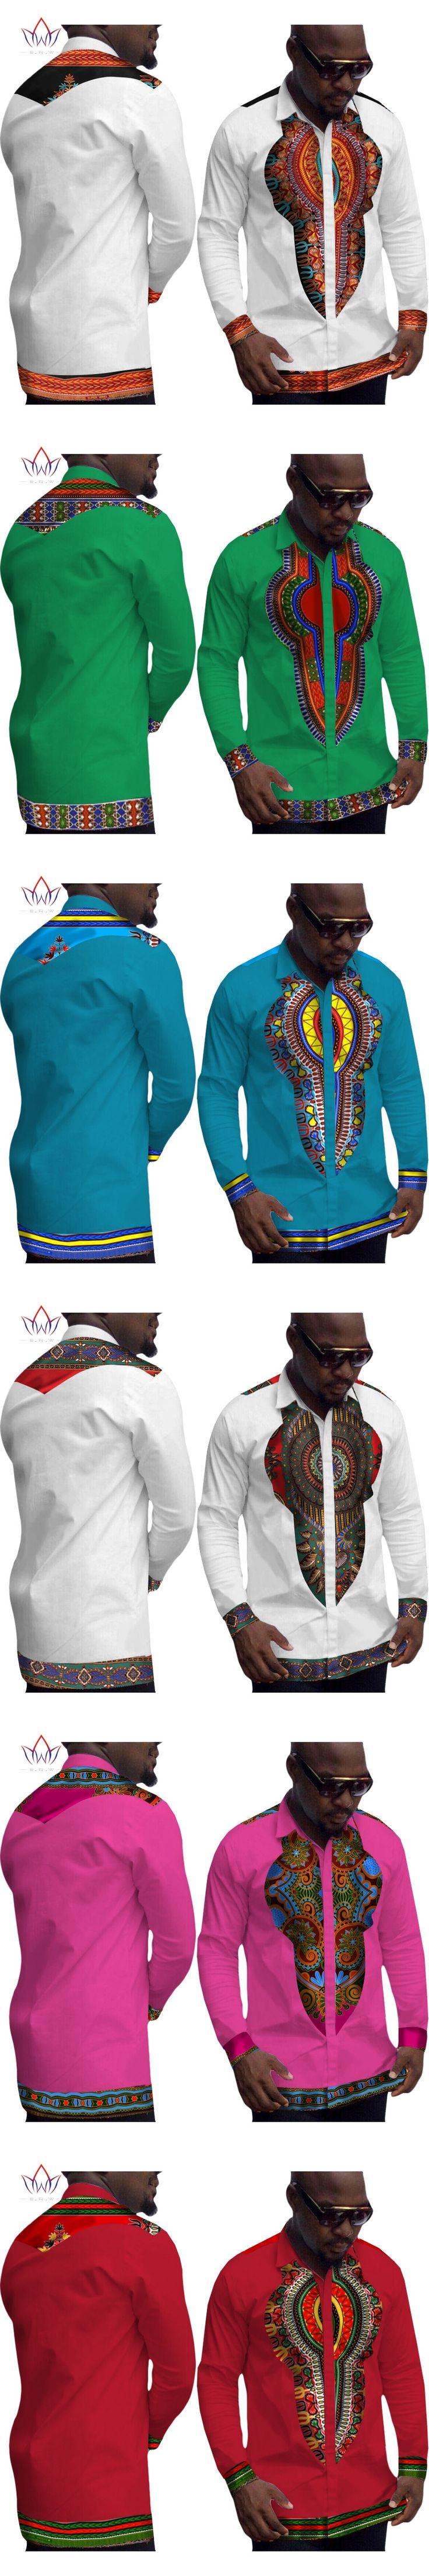 African Clothes for Men Mens Dress Shirt Dashiki Men Brand-Clothing Long Sleeve White Shirt Men Plus Size Clothing 6XL WYN152